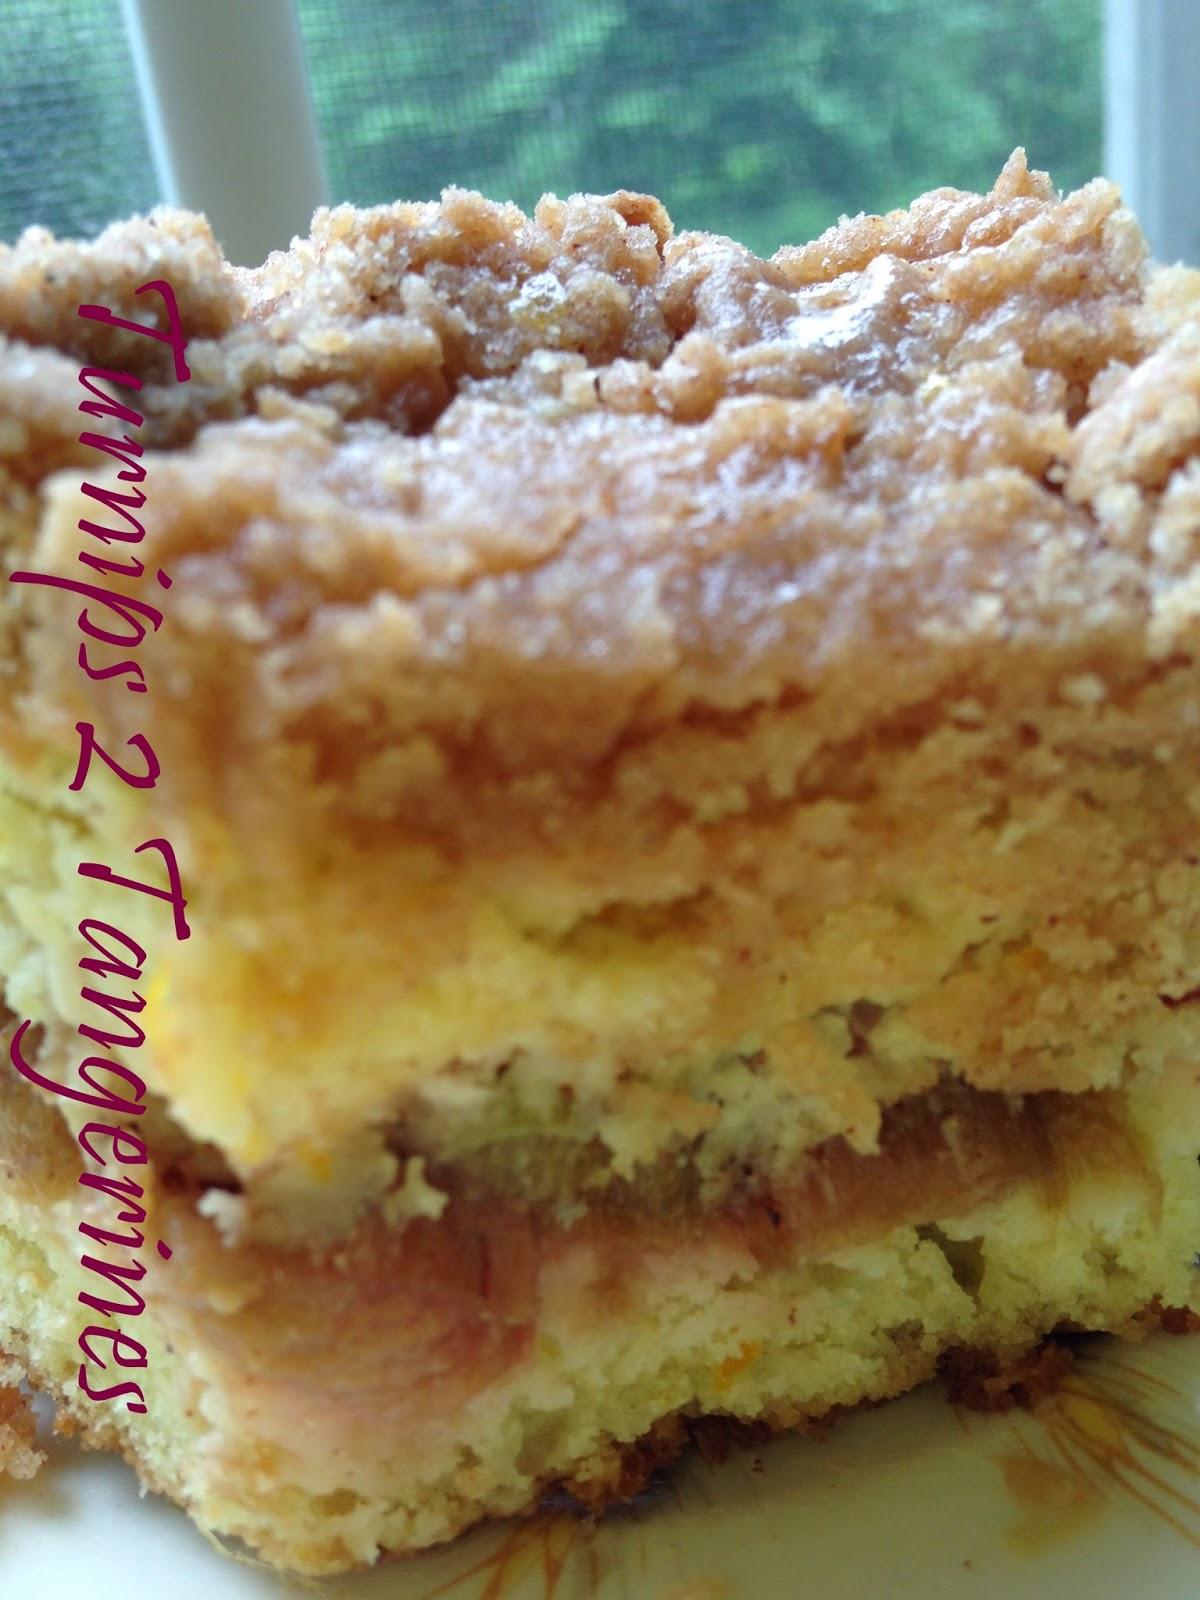 Rhubarb Cake Using Frozen Rhubarb